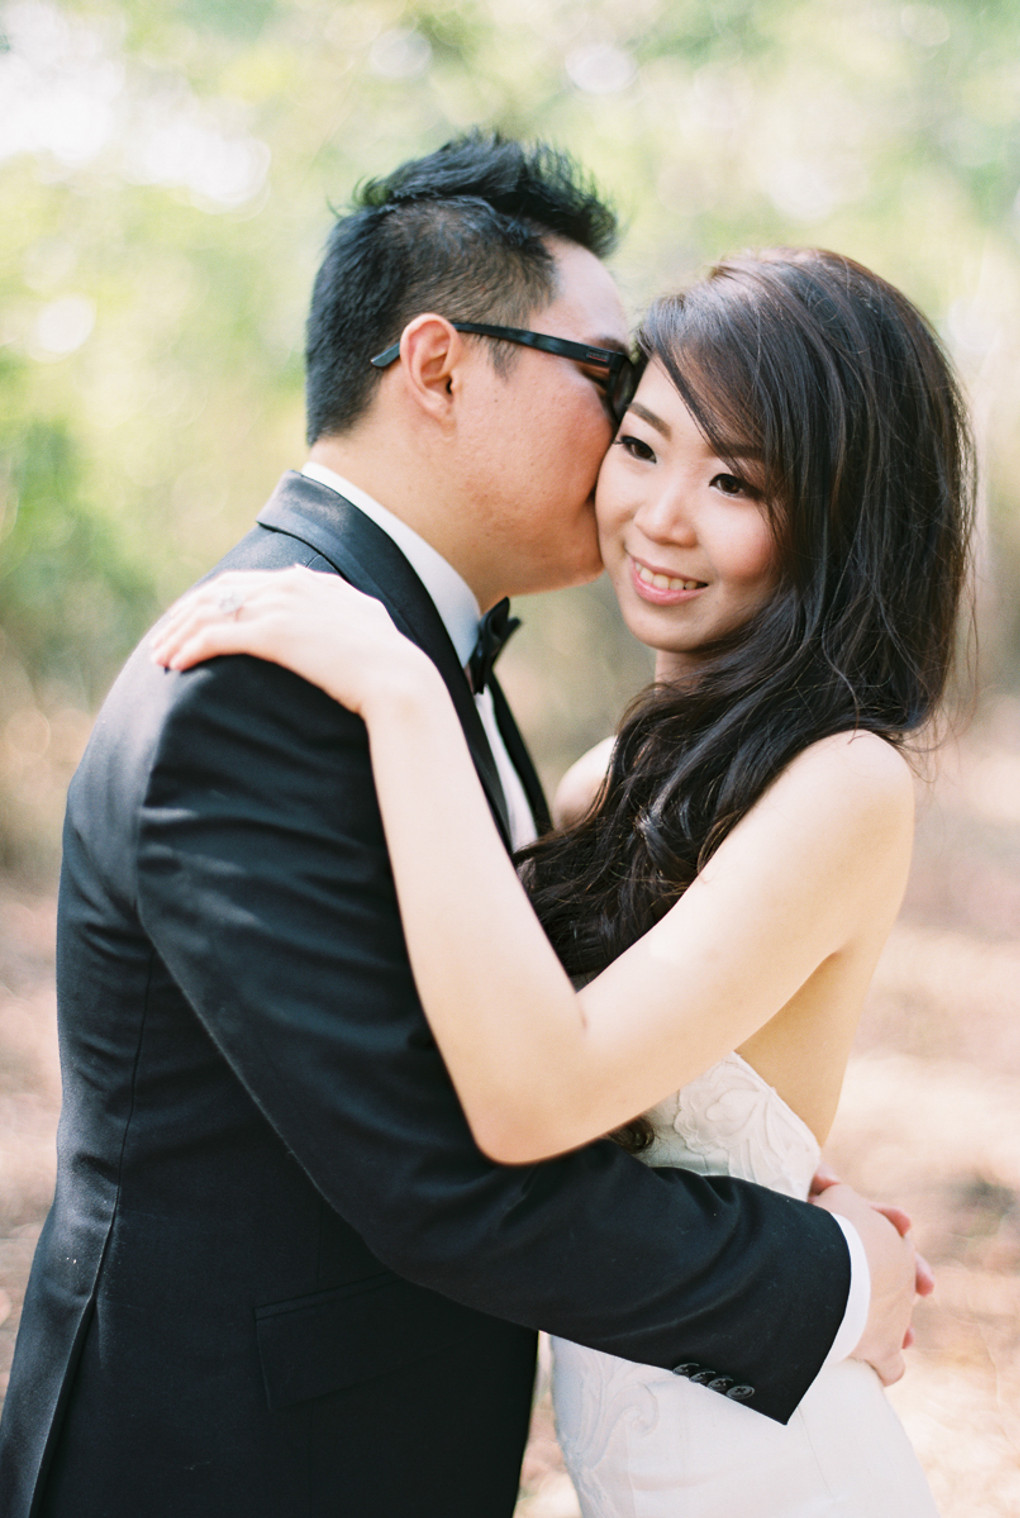 When Natural Beauty Meets Ethereal Elegance - Bridestory Blog